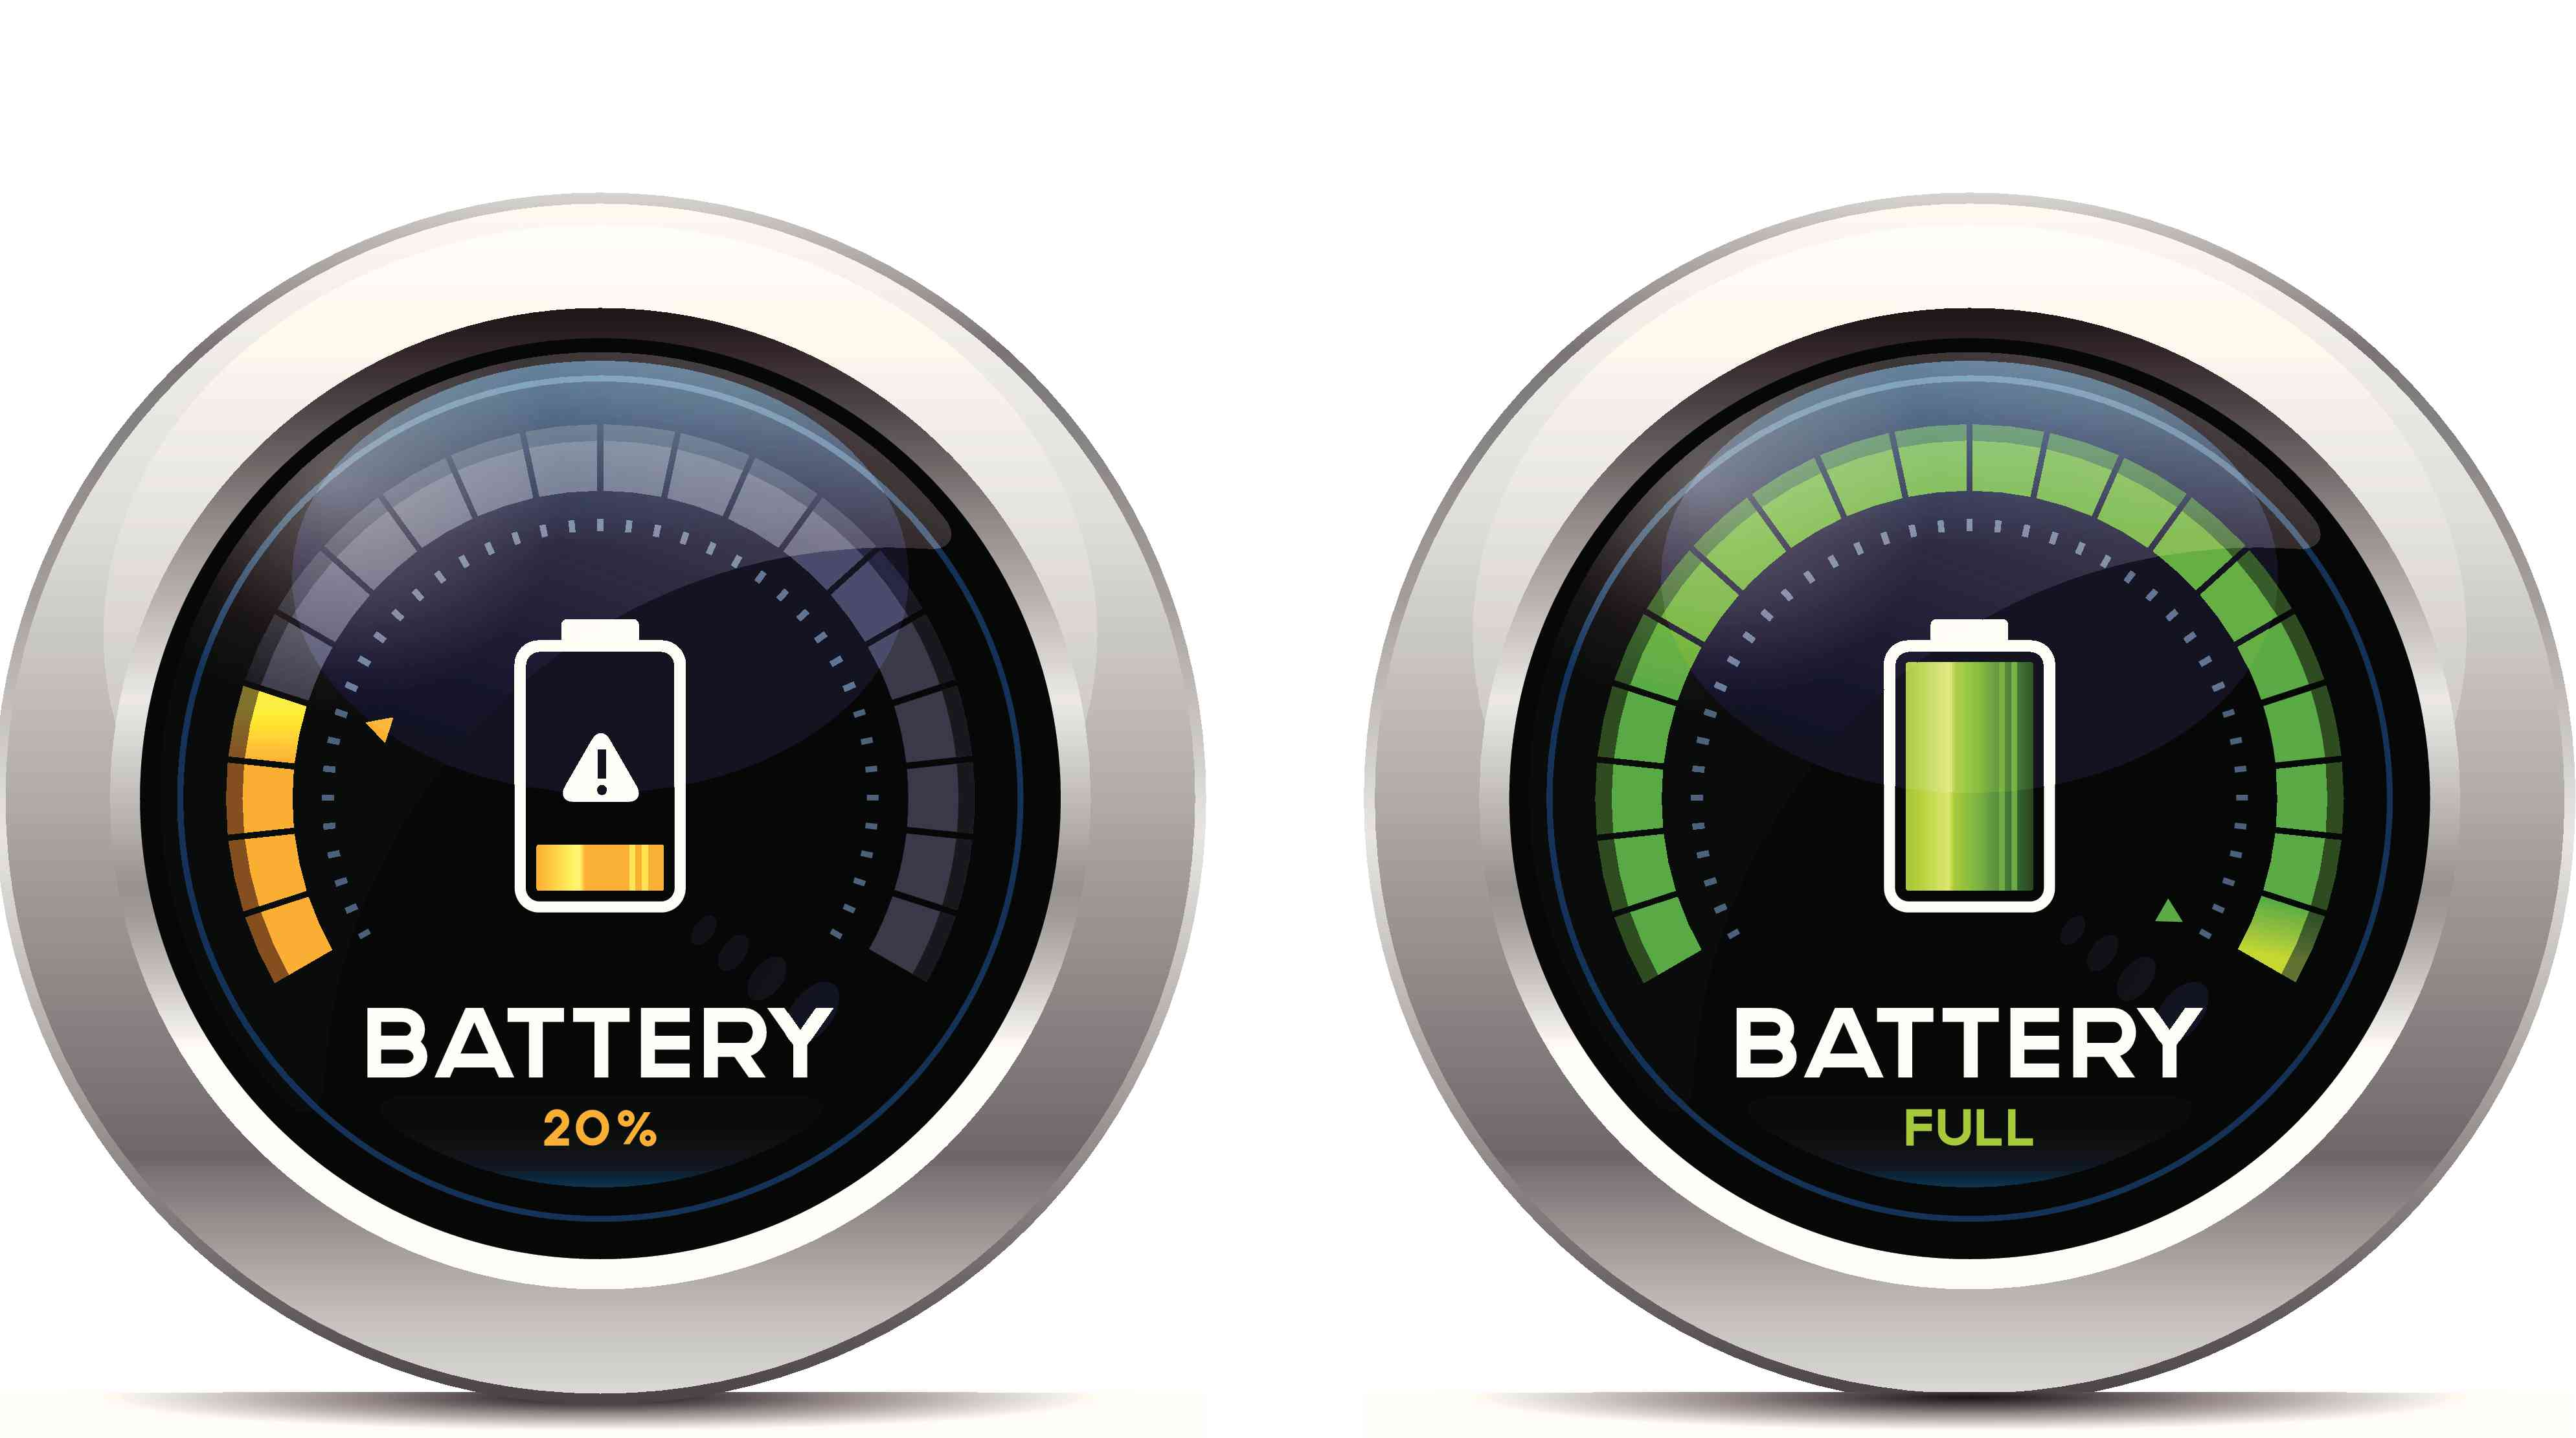 Battery indicators at partial and full